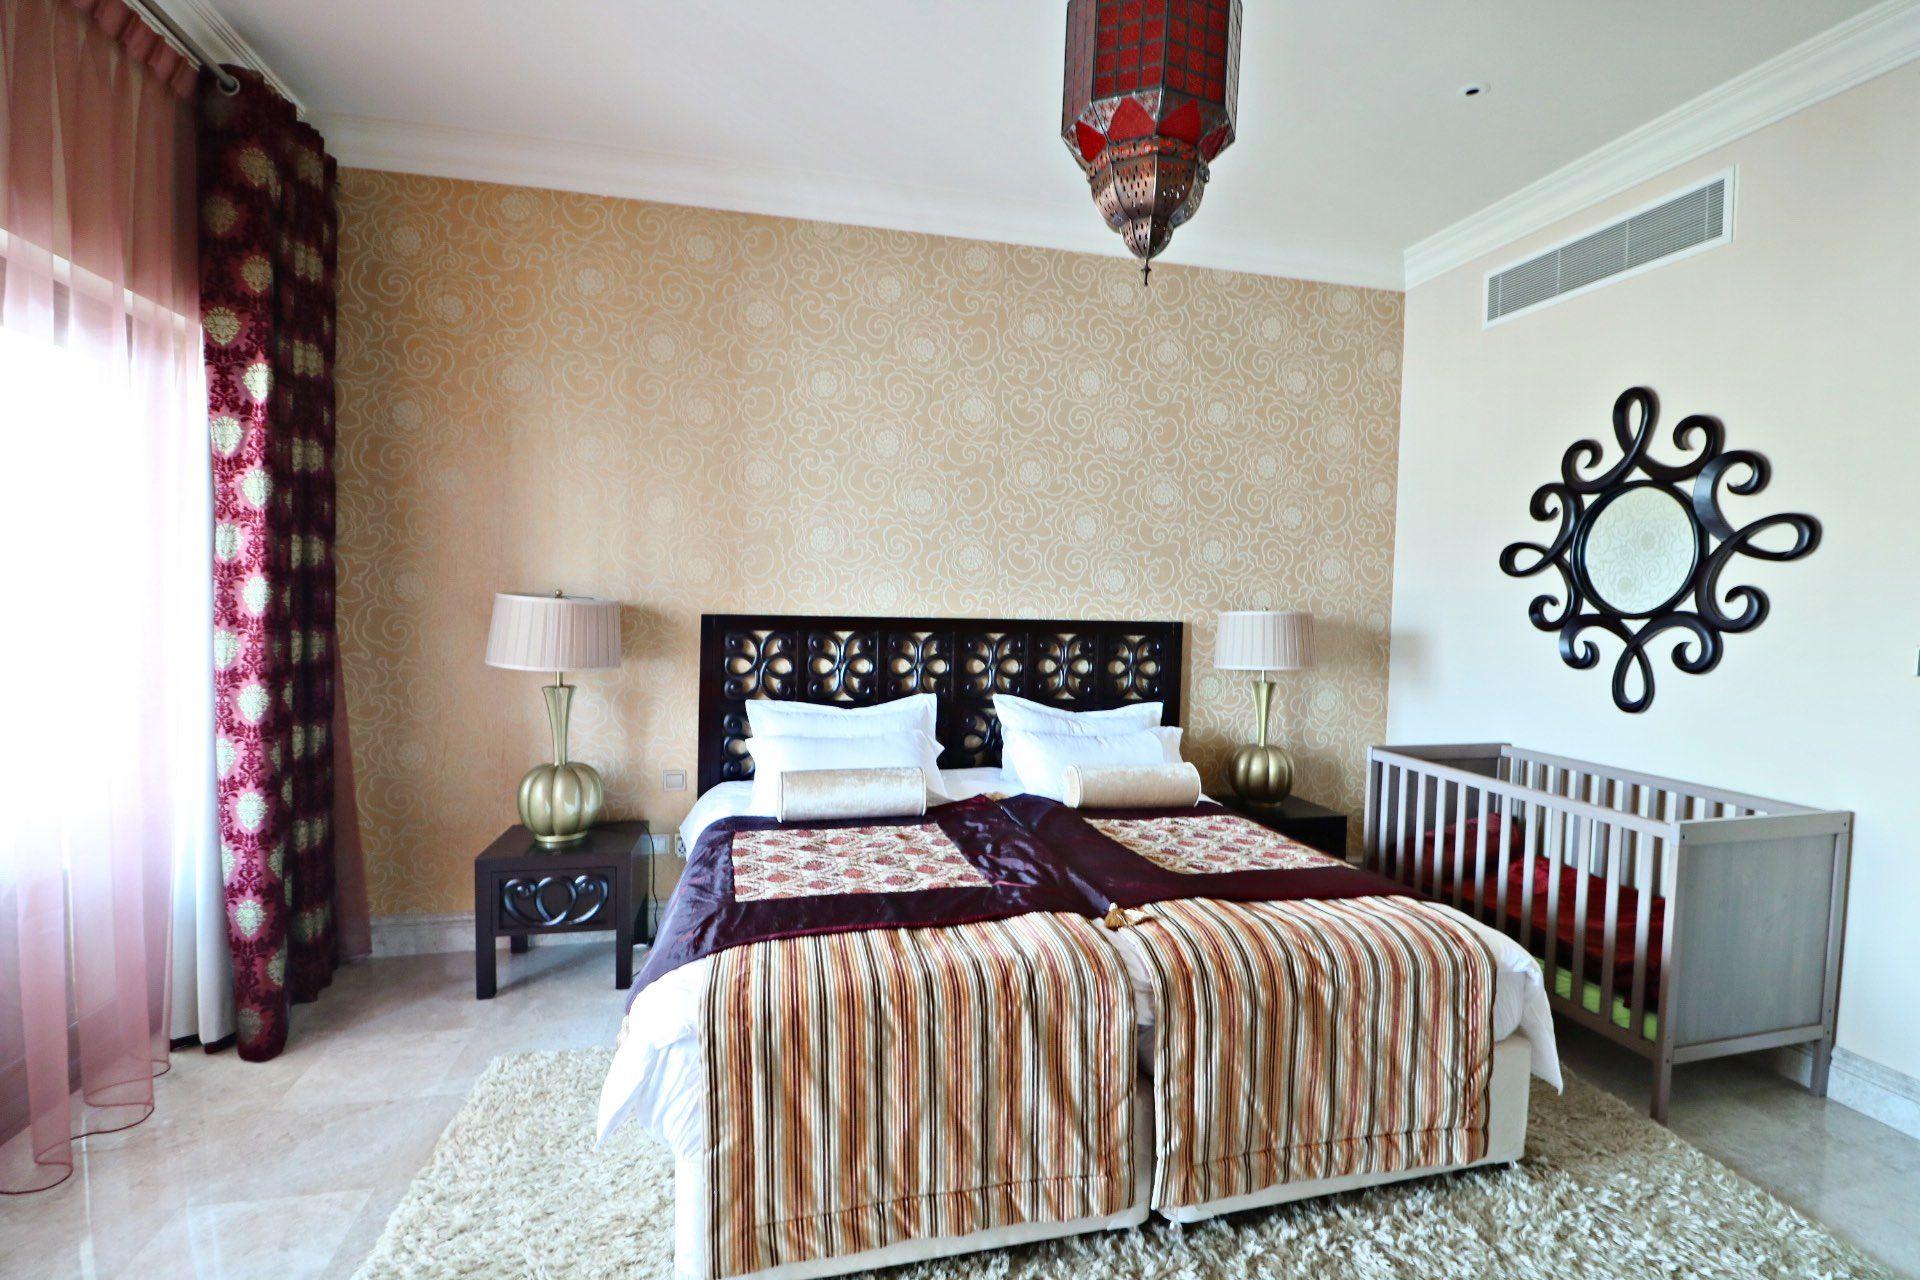 Spectacular 1 Bedroom Apartment for Rent in Dubai Marina